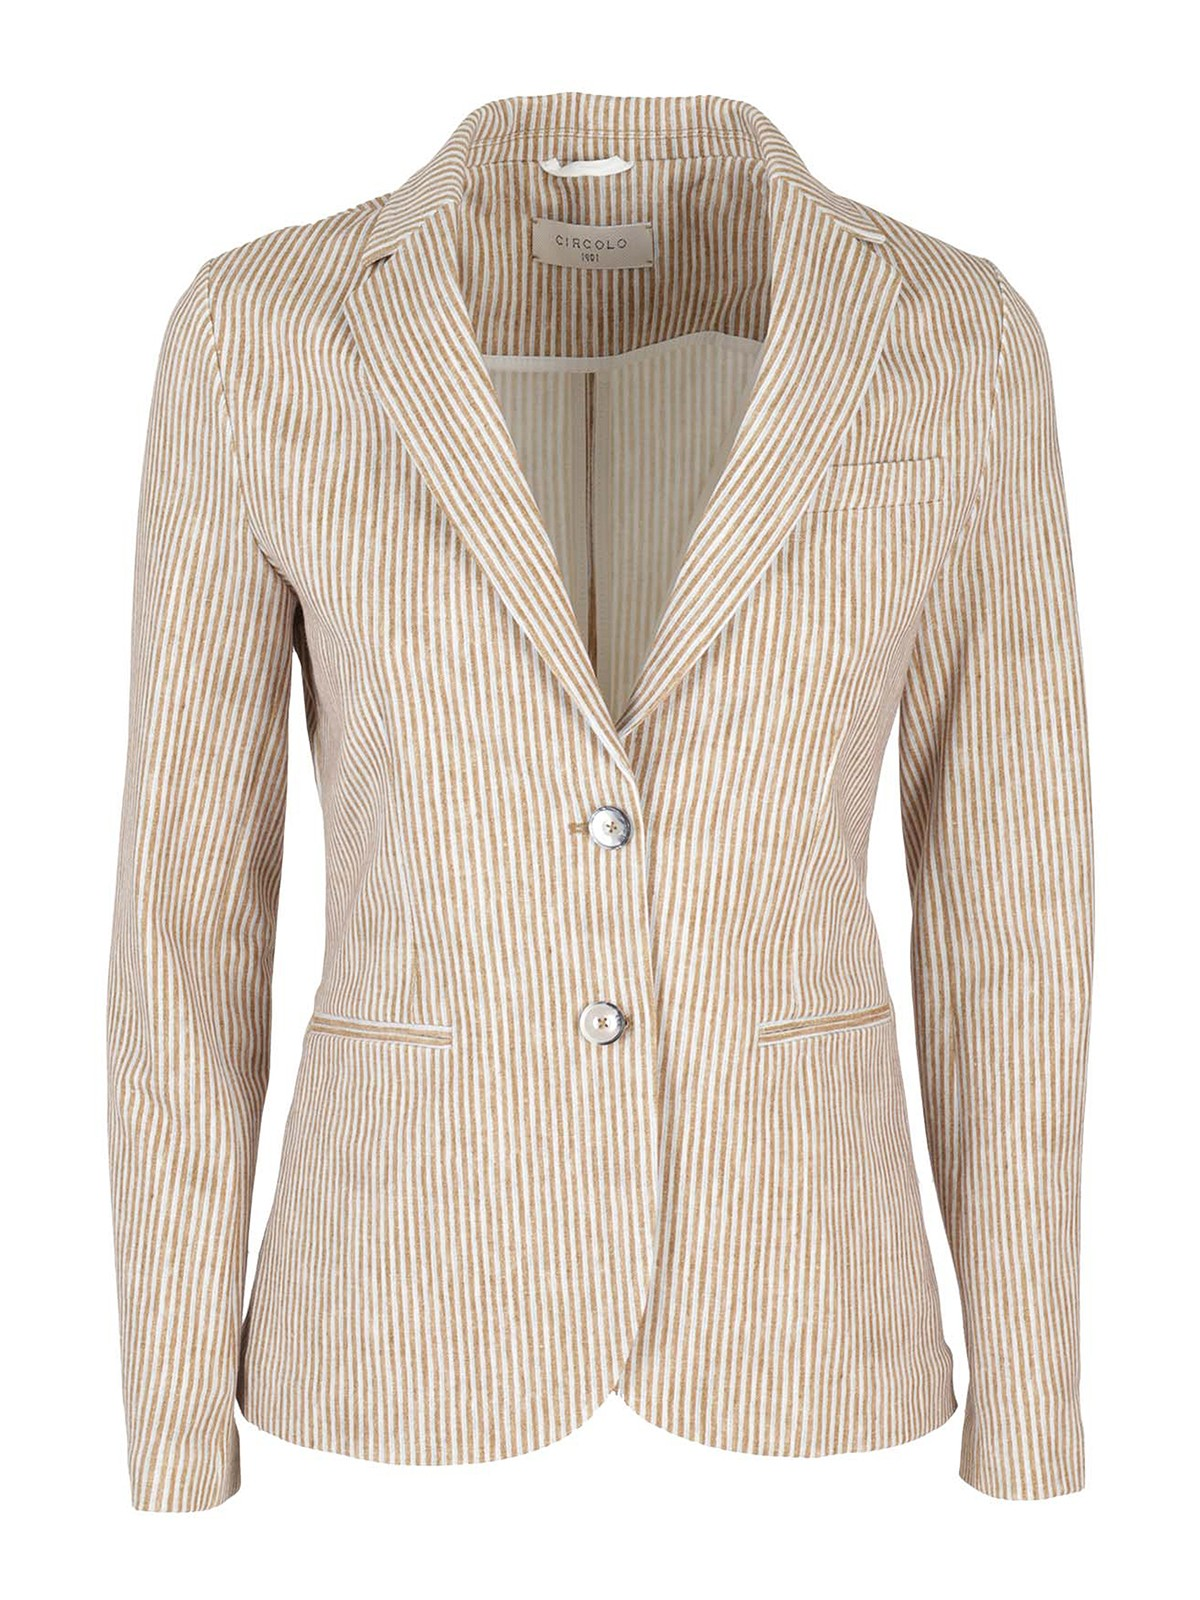 Circolo 1901 Clothing STRIPED BLAZER